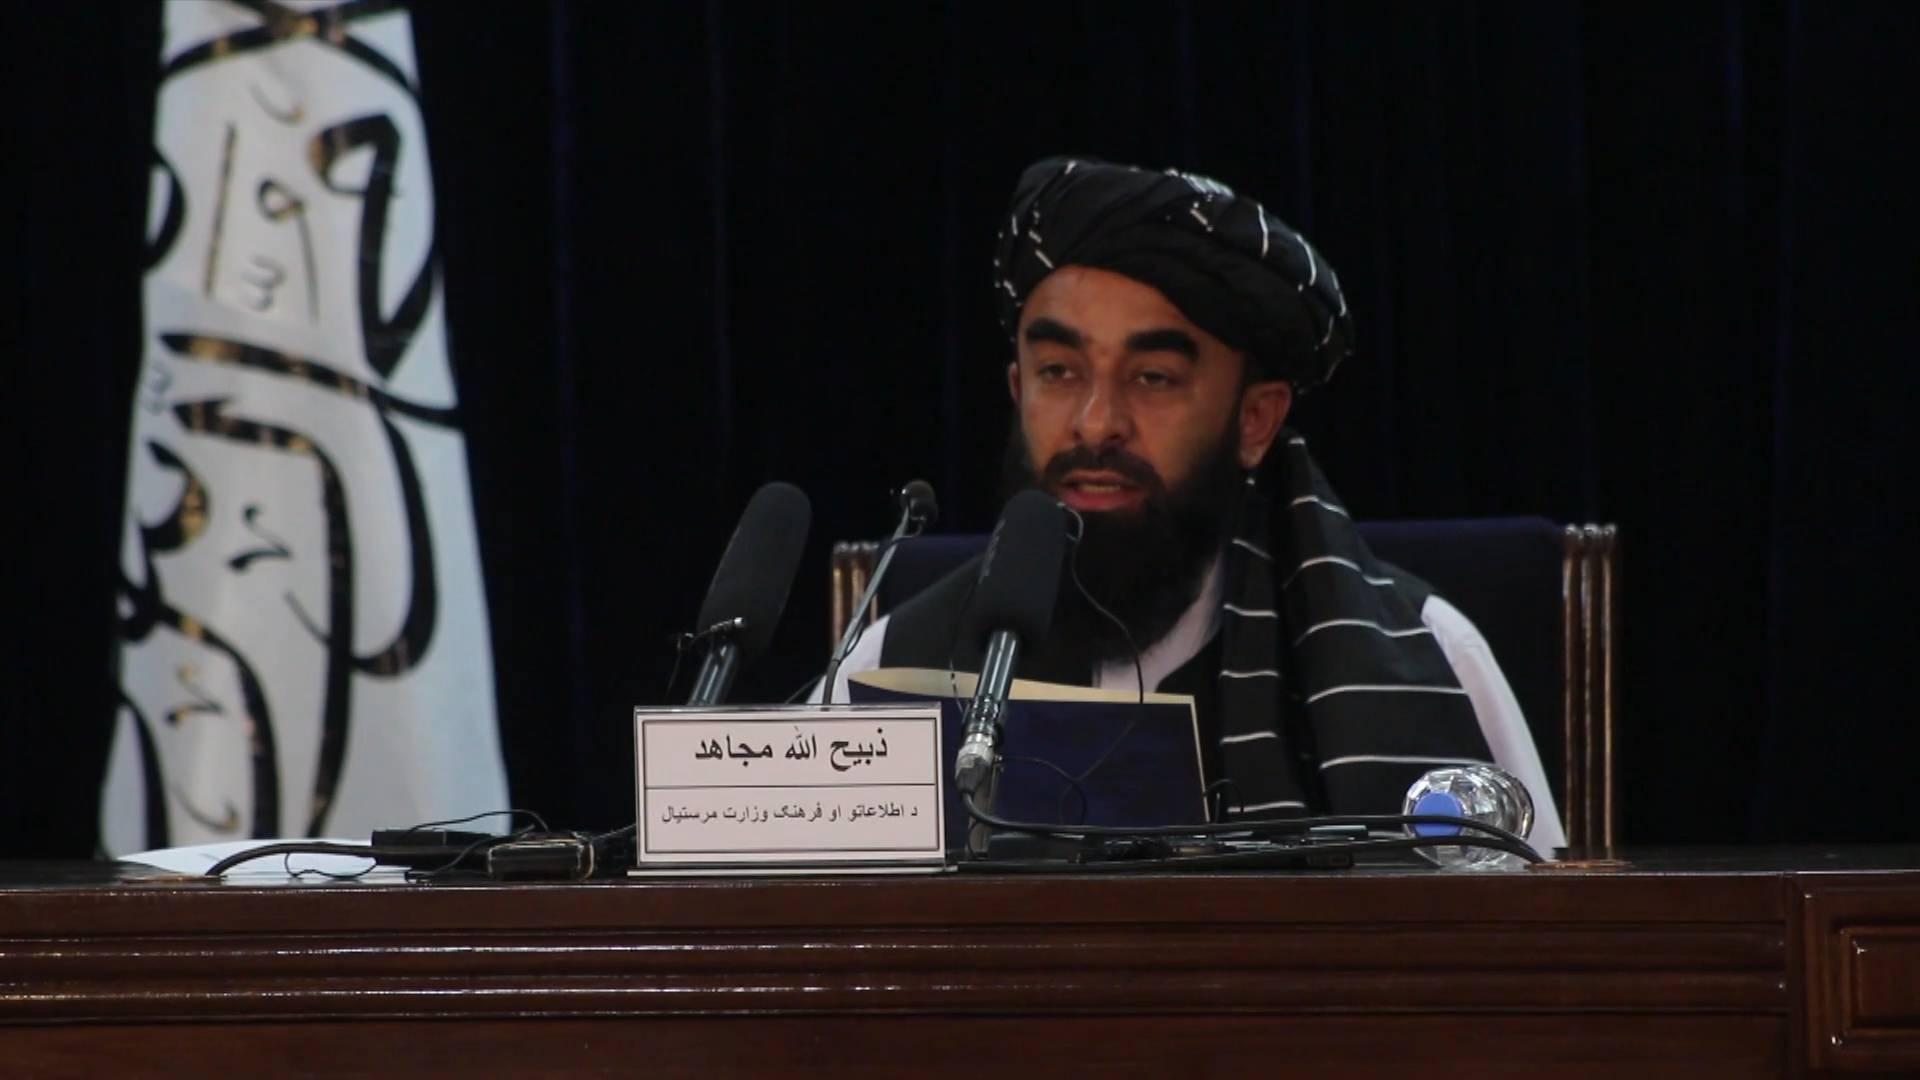 GLOBALink | Taliban names remaining ministers in Afghan caretaker gov't